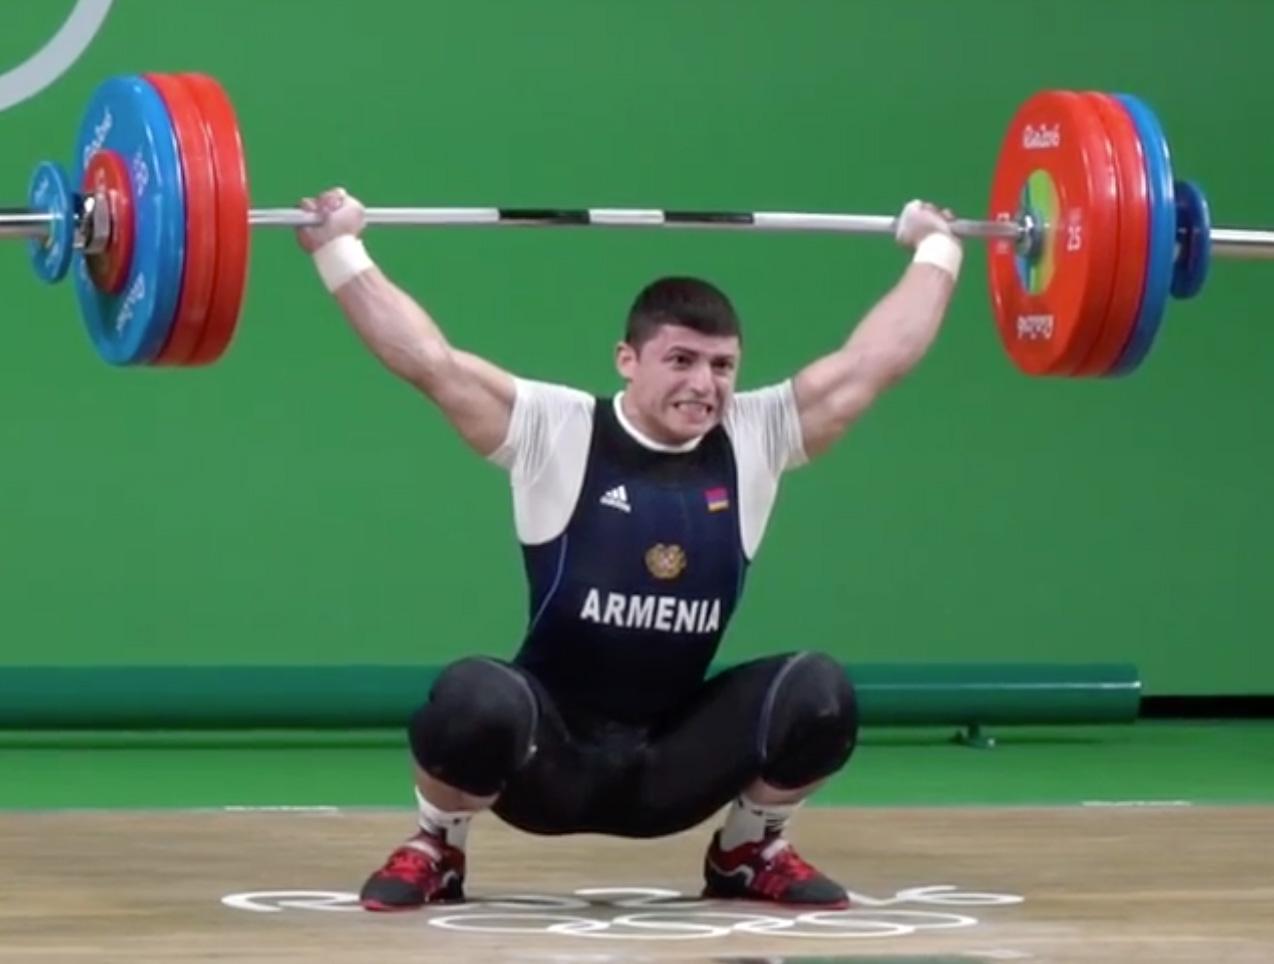 Andranik Karapetyan 174kg Snatch 2016 Olympic Games All